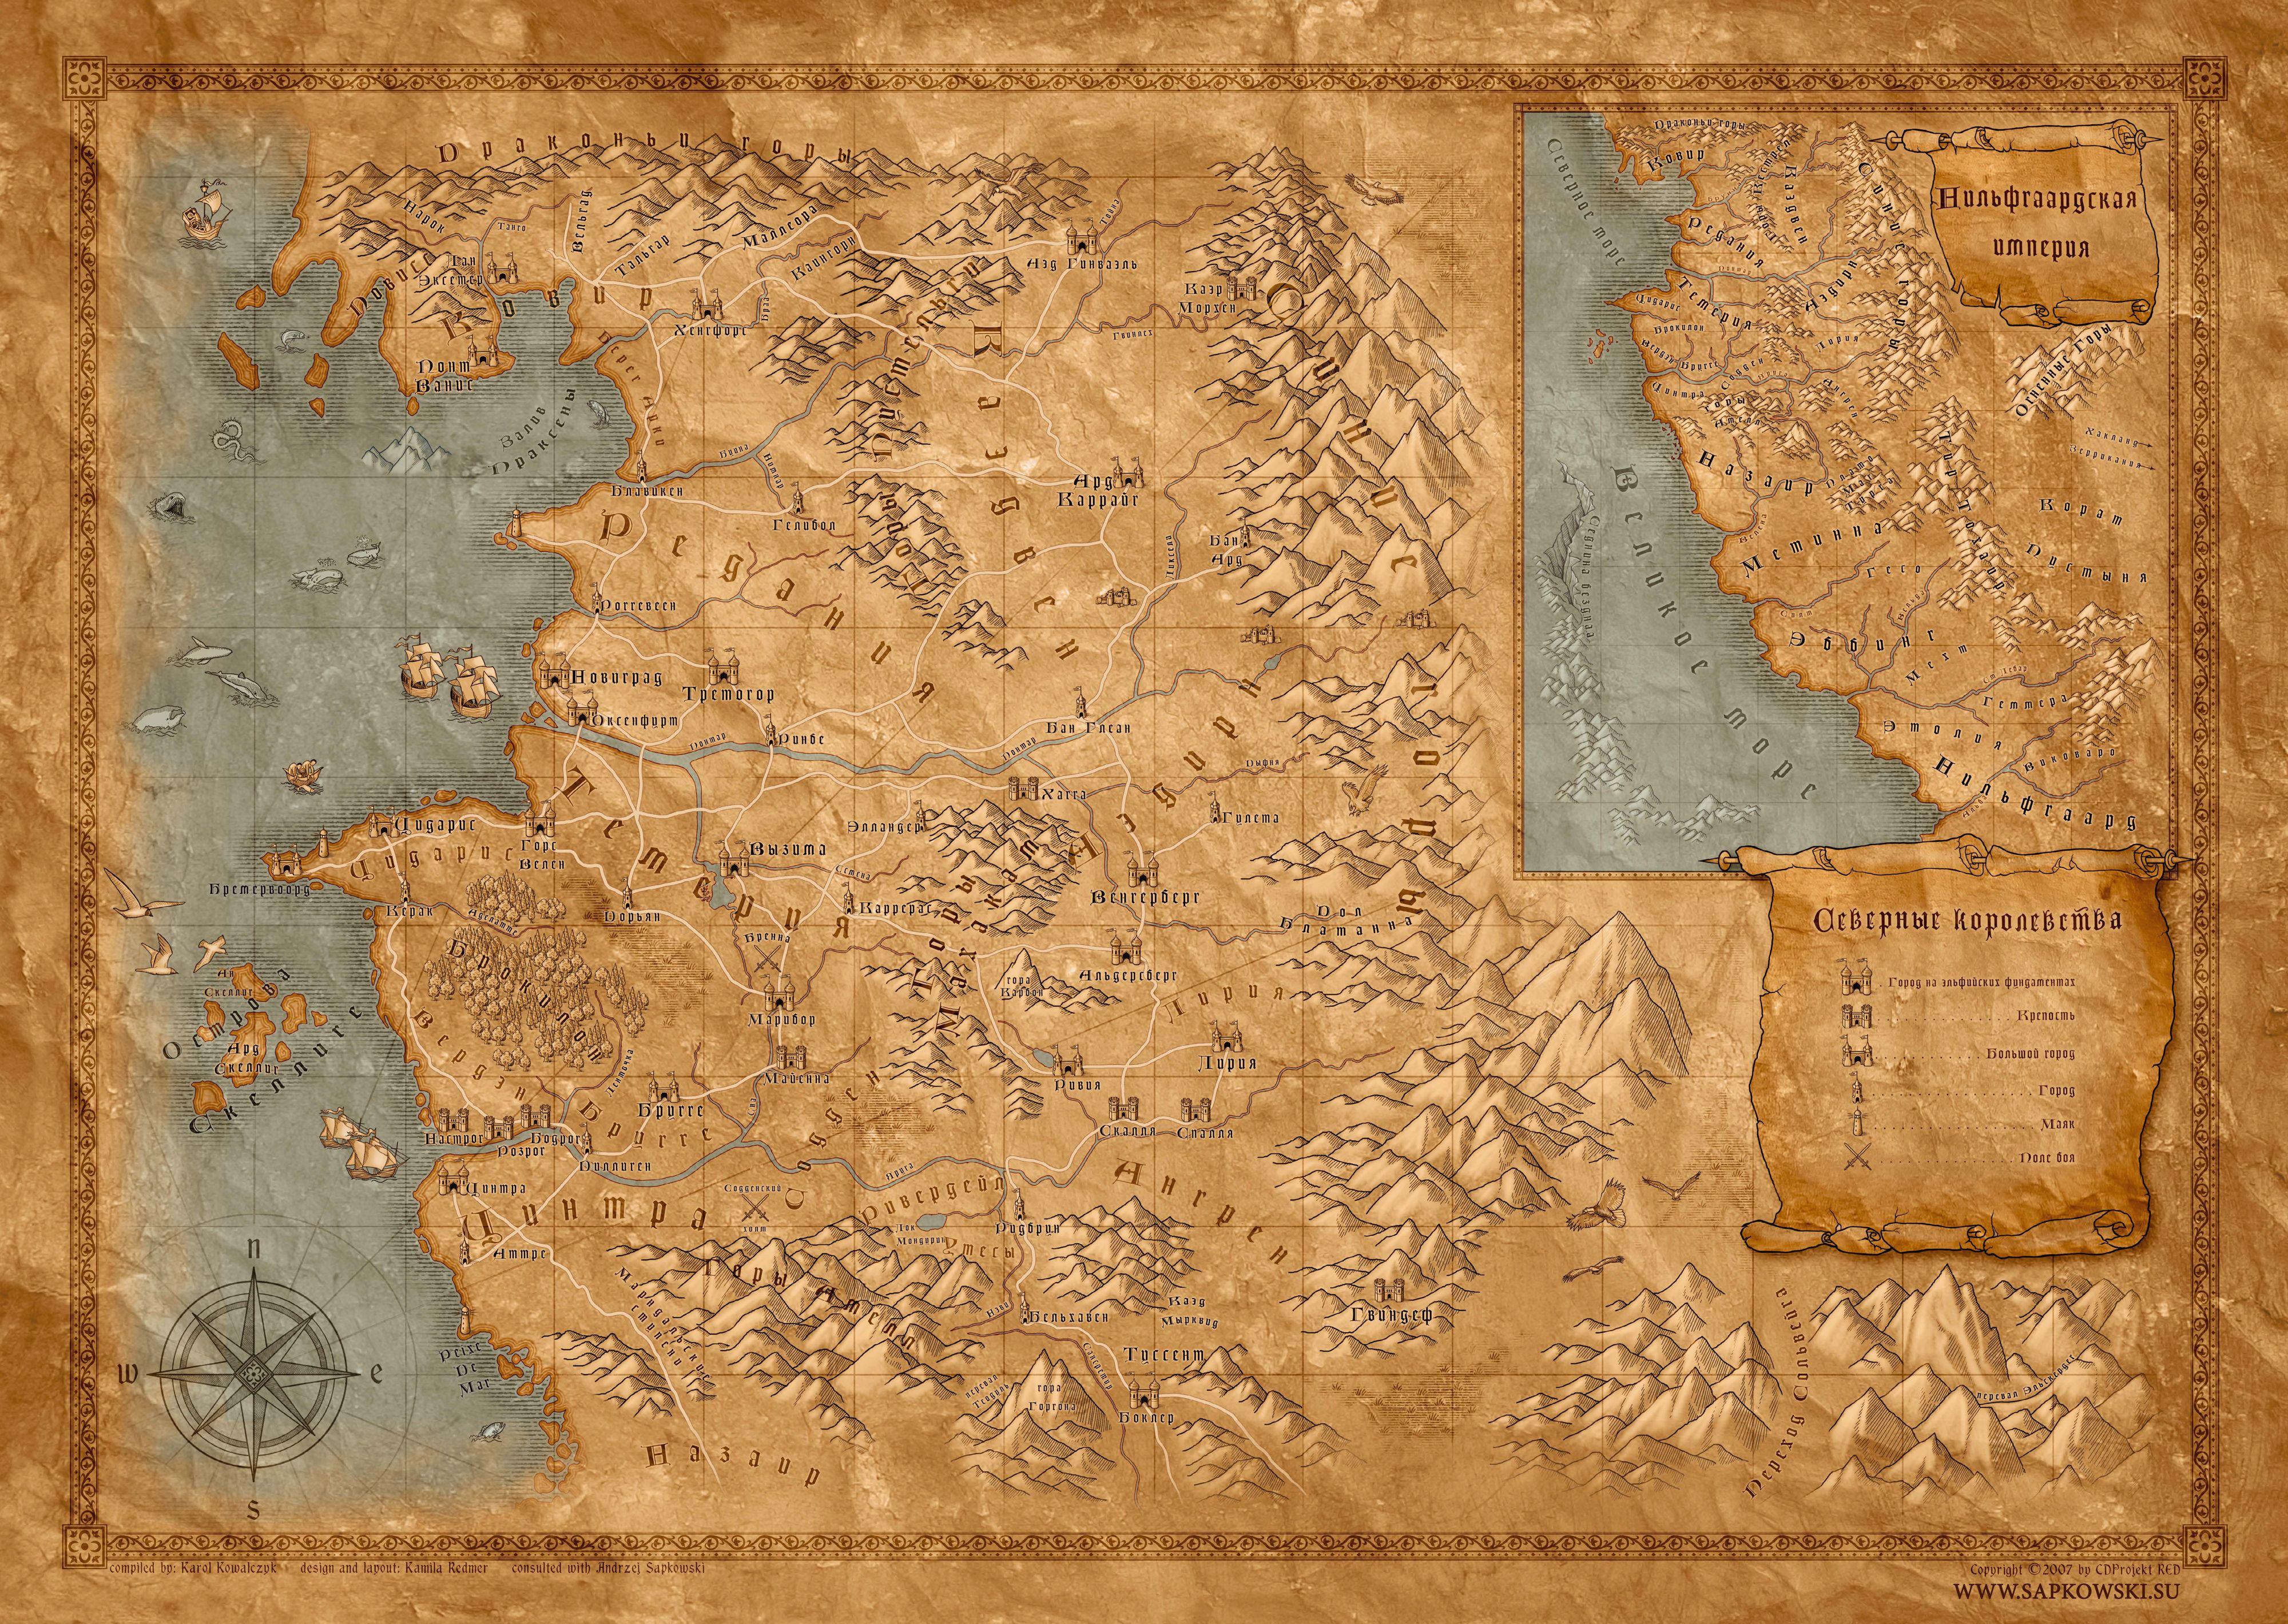 http://www.sapkowski.su/modules/Gallery/Files/witcher_world_maps/map_CDPR1.jpg